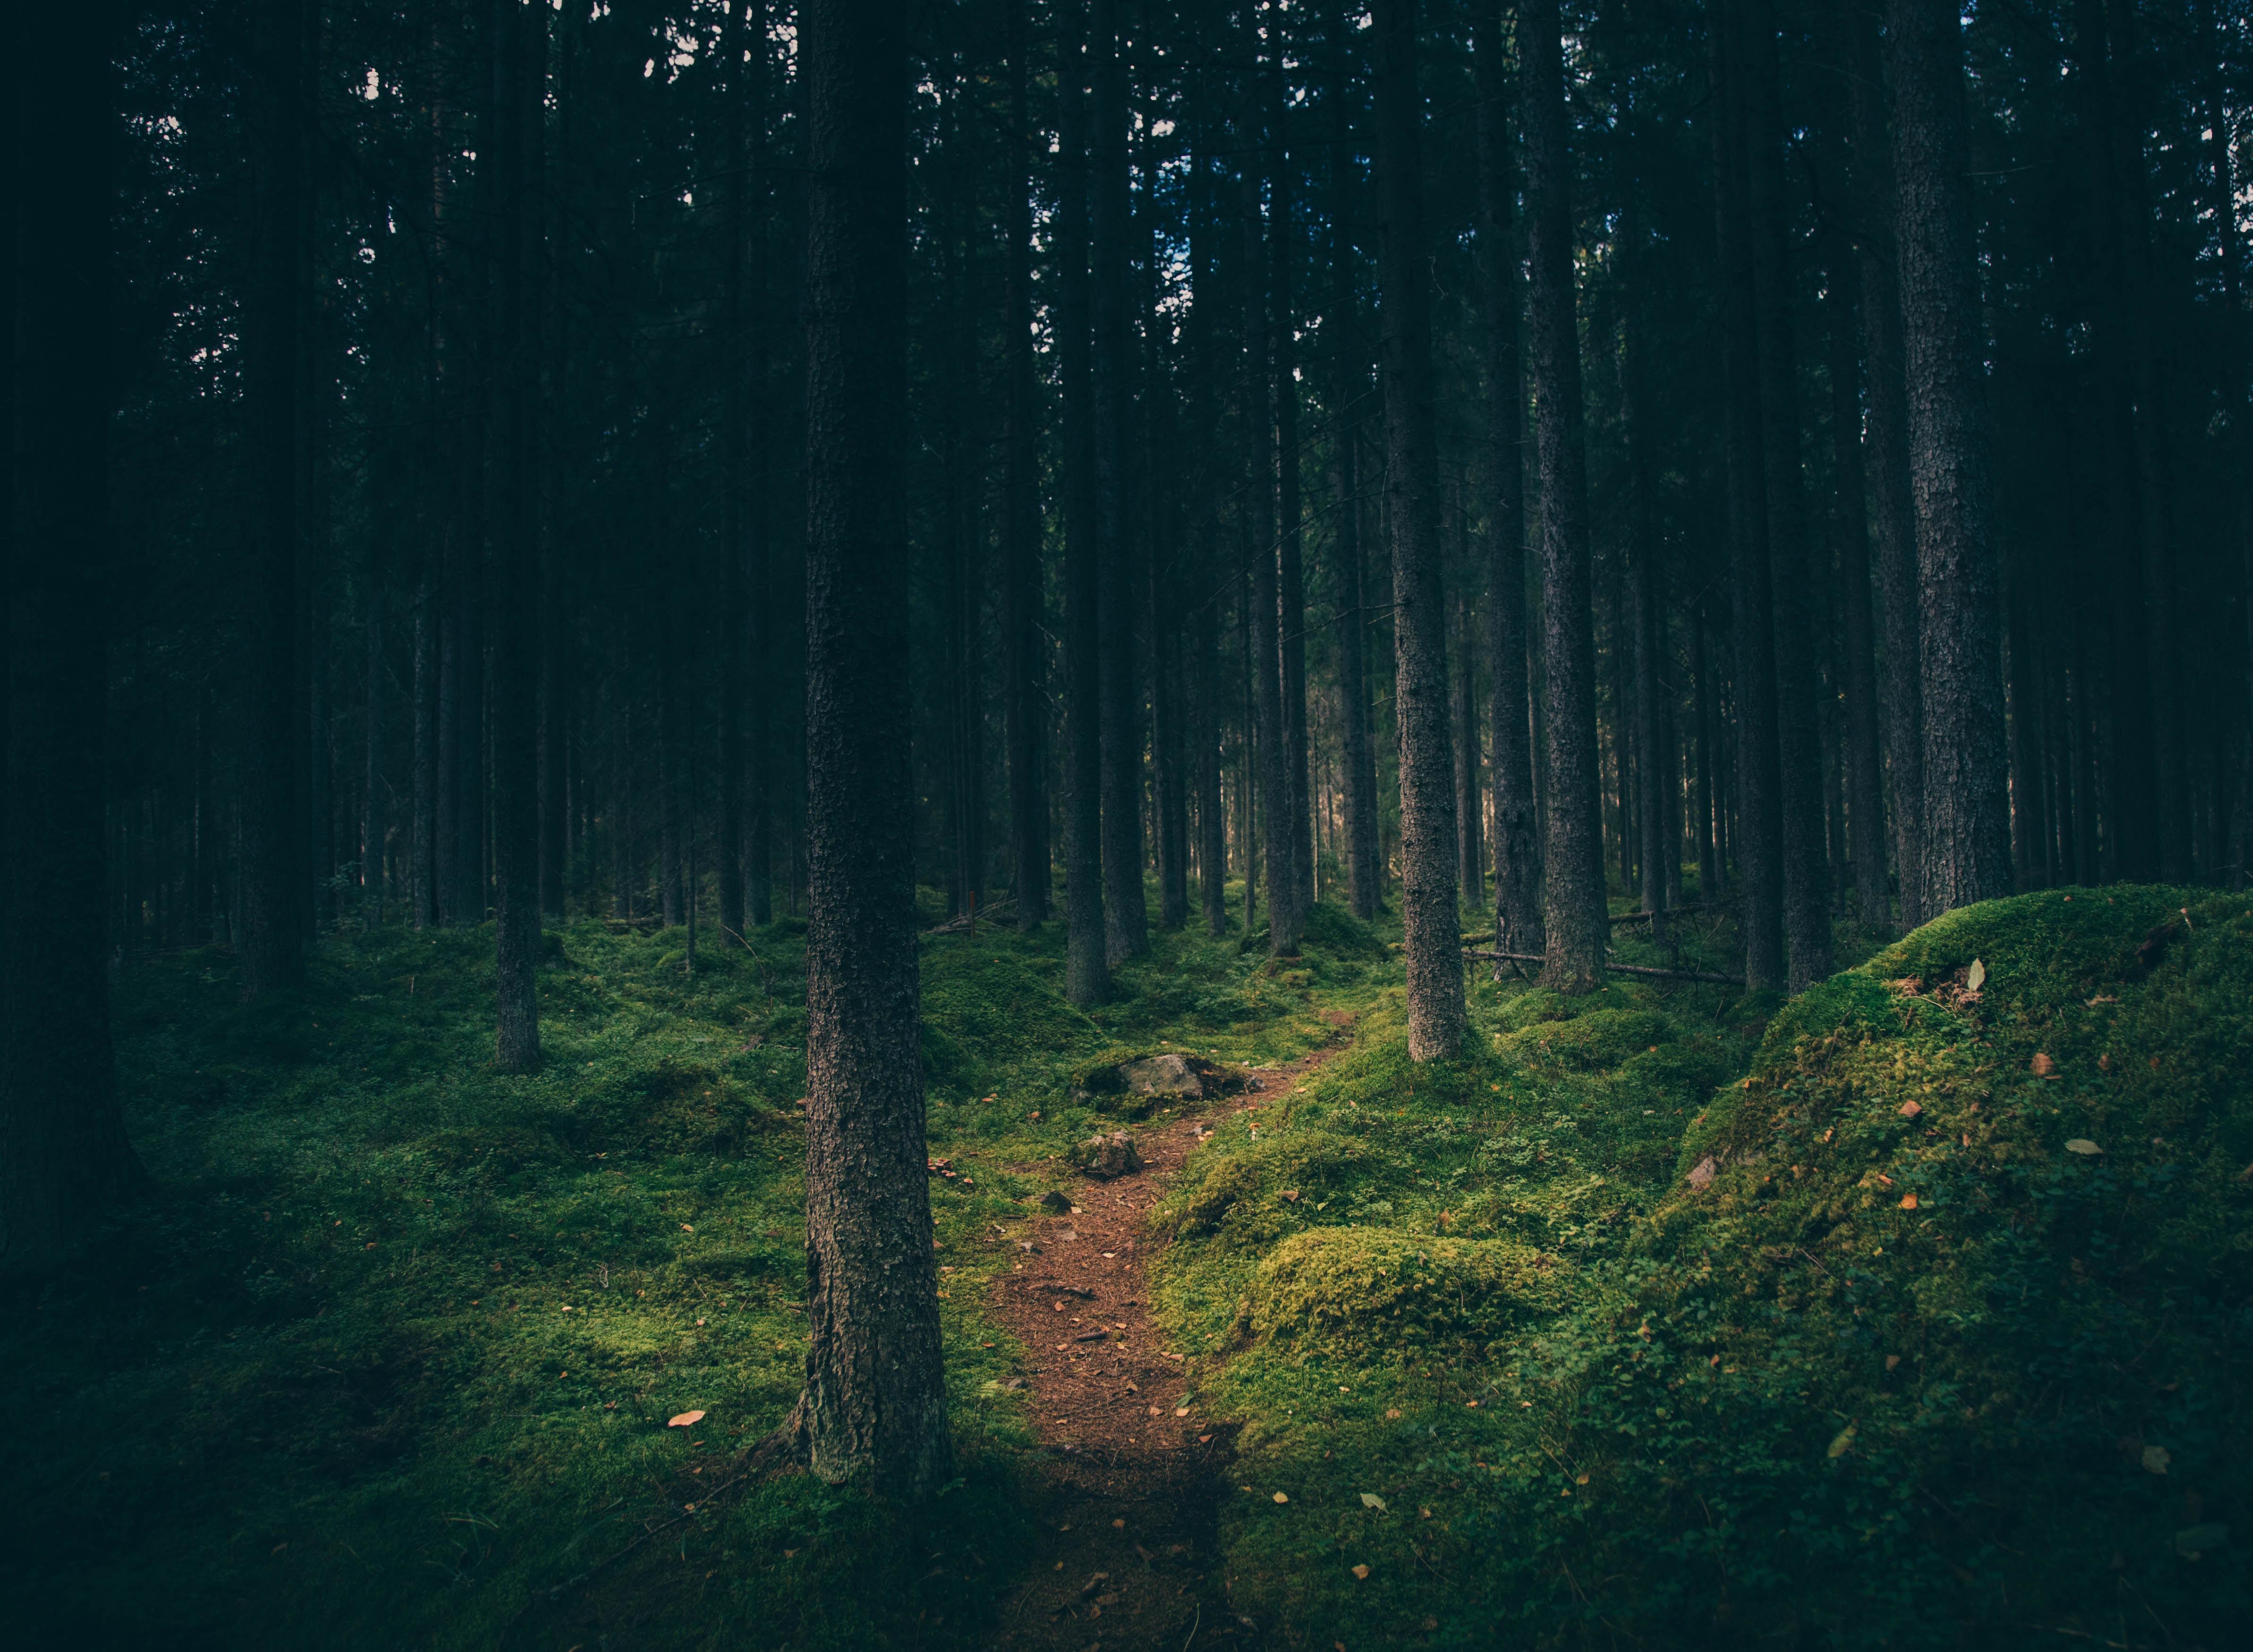 A narrow footpath in a dark forest in Gävle